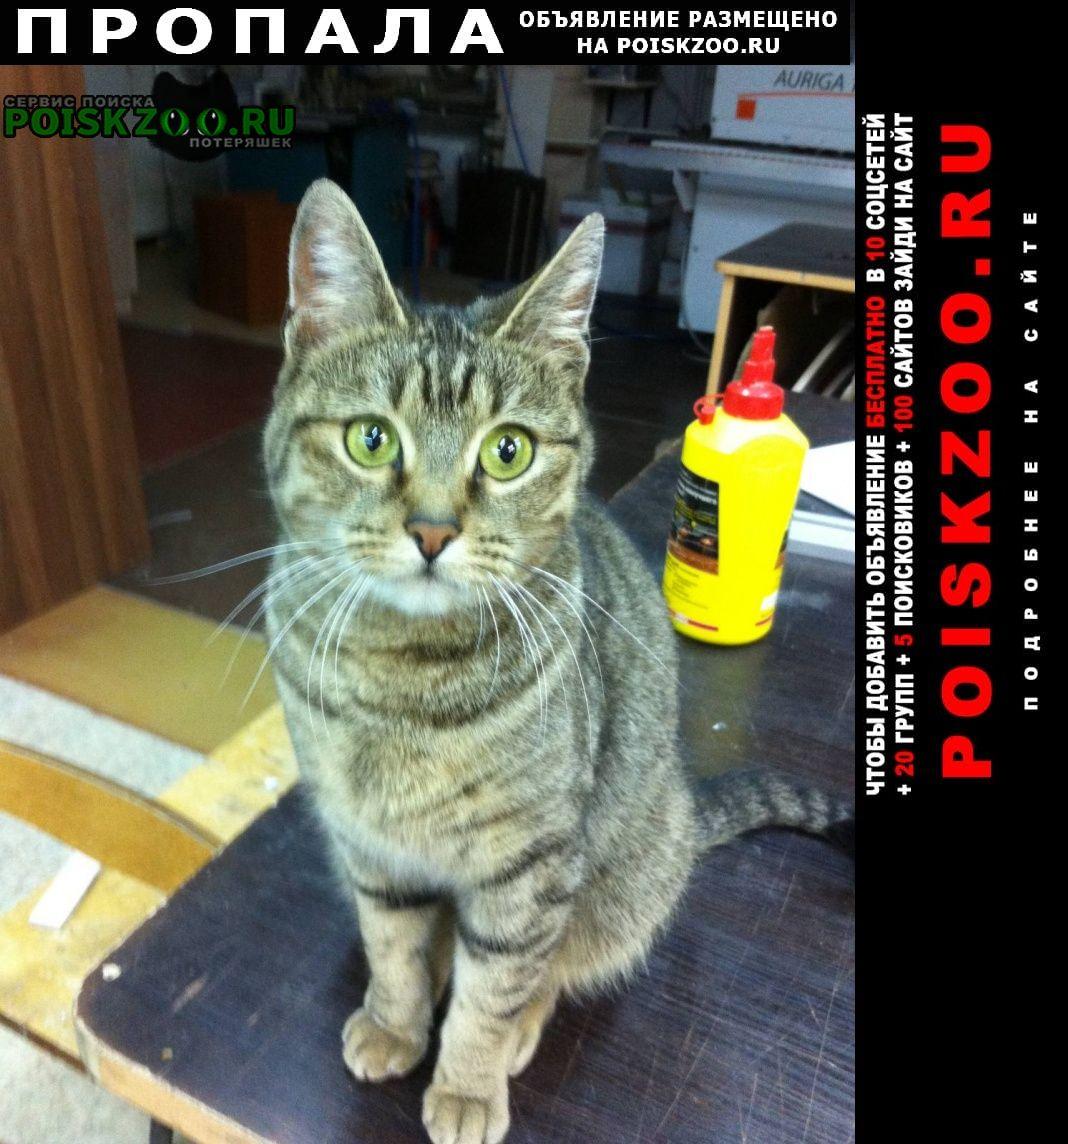 Мурманск Пропала кошка домашняя муся 8 лет